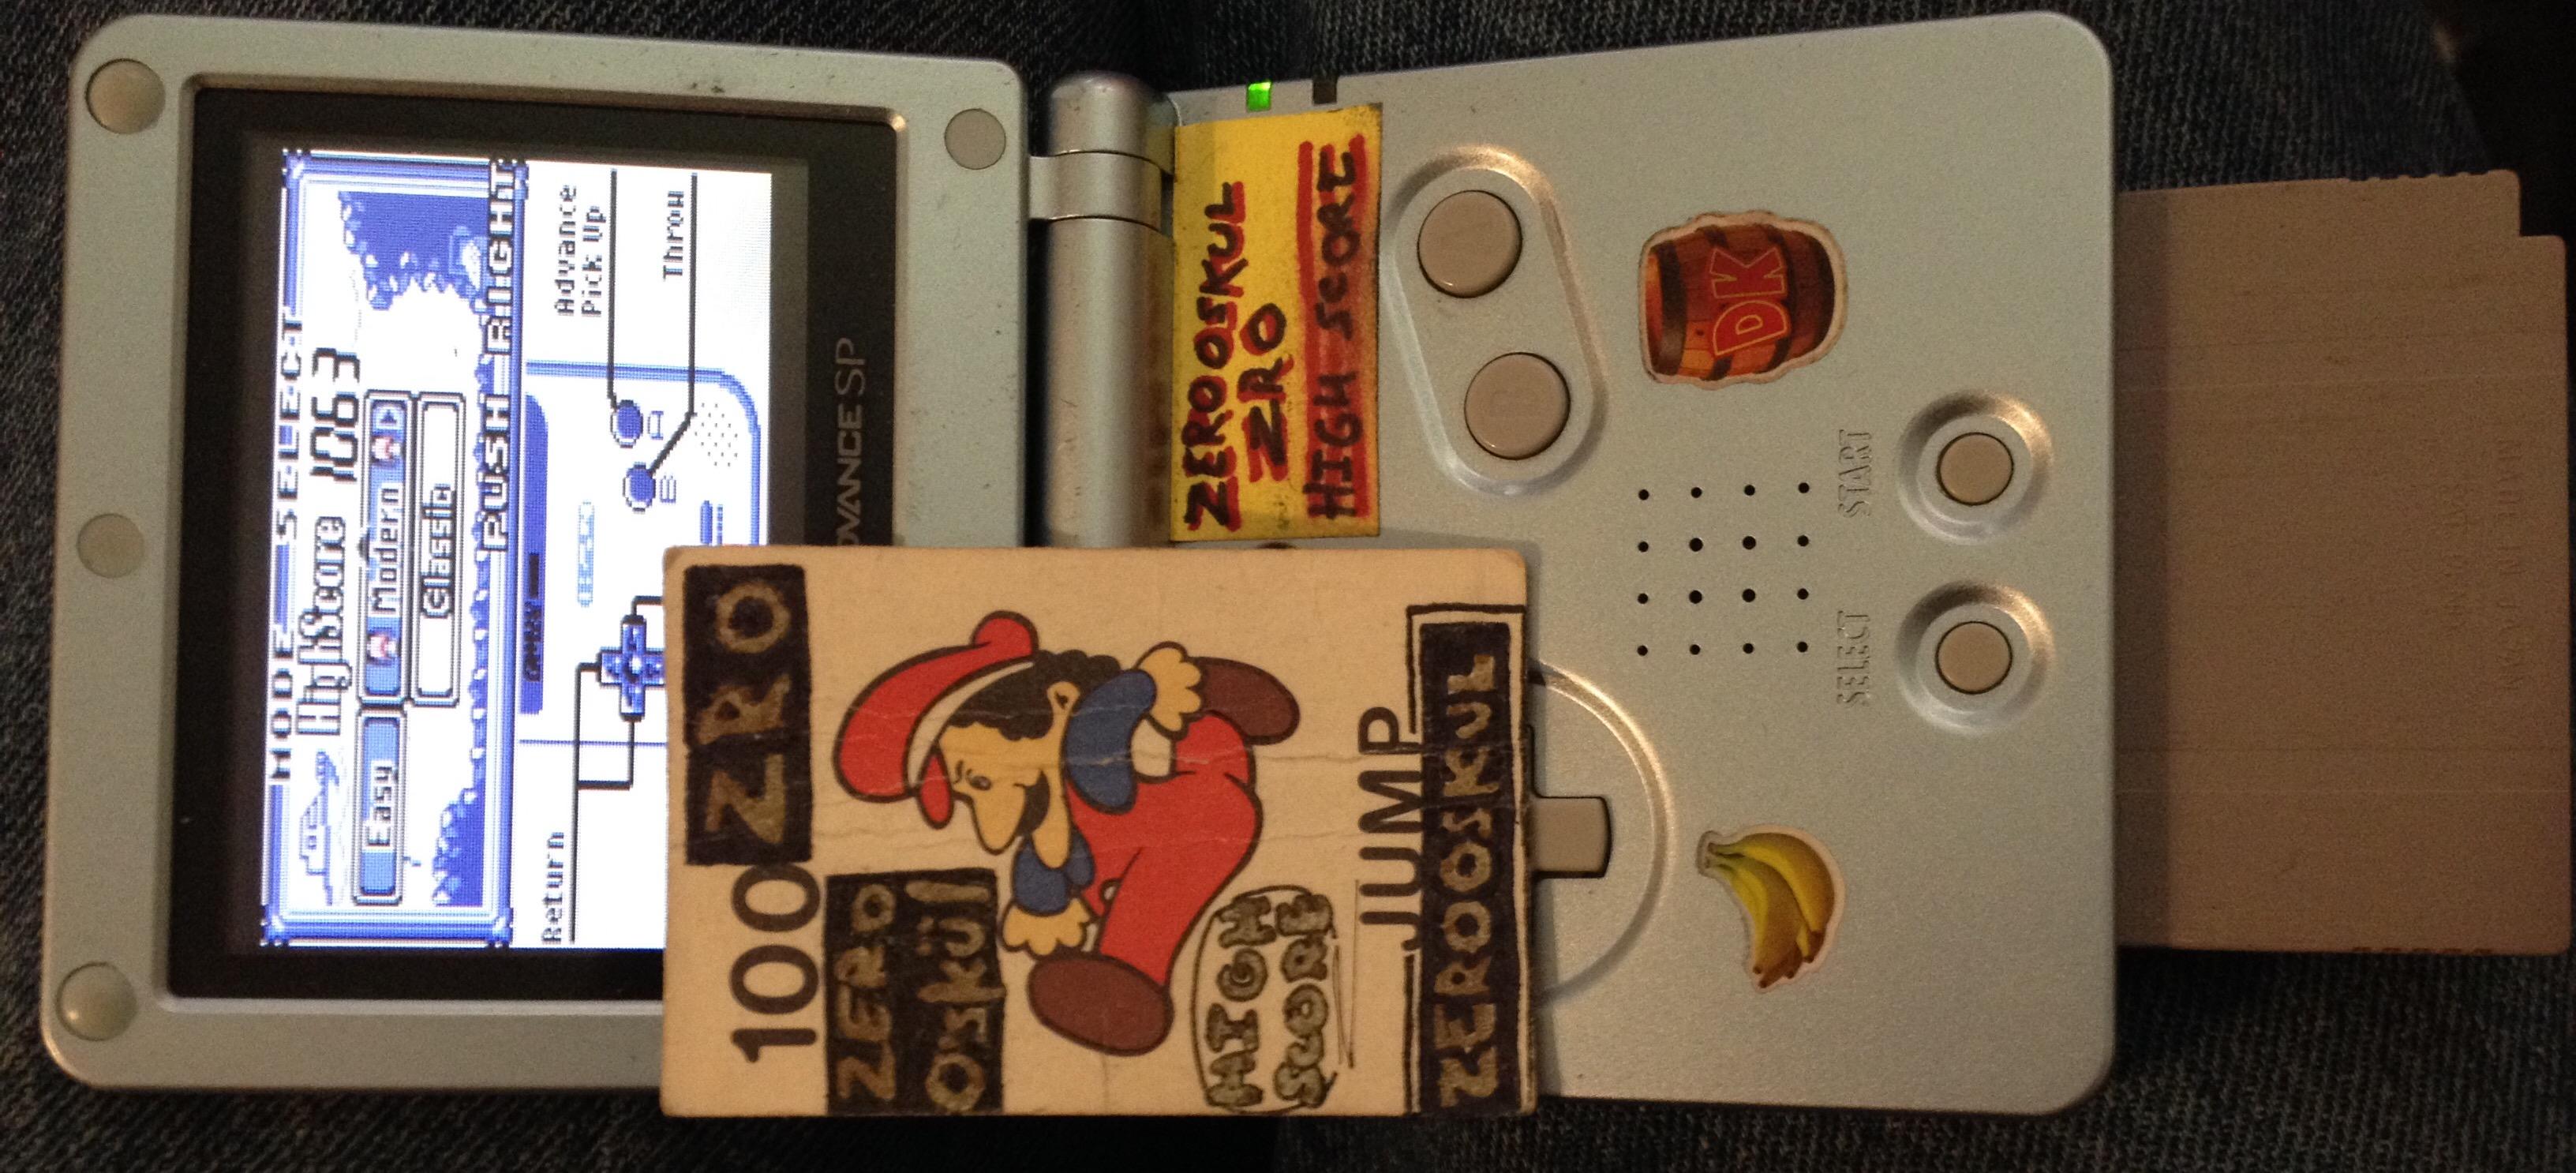 zerooskul: Game & Watch Gallery: Octopus [Modern: Easy] (Game Boy) 1,063 points on 2019-05-31 11:42:36